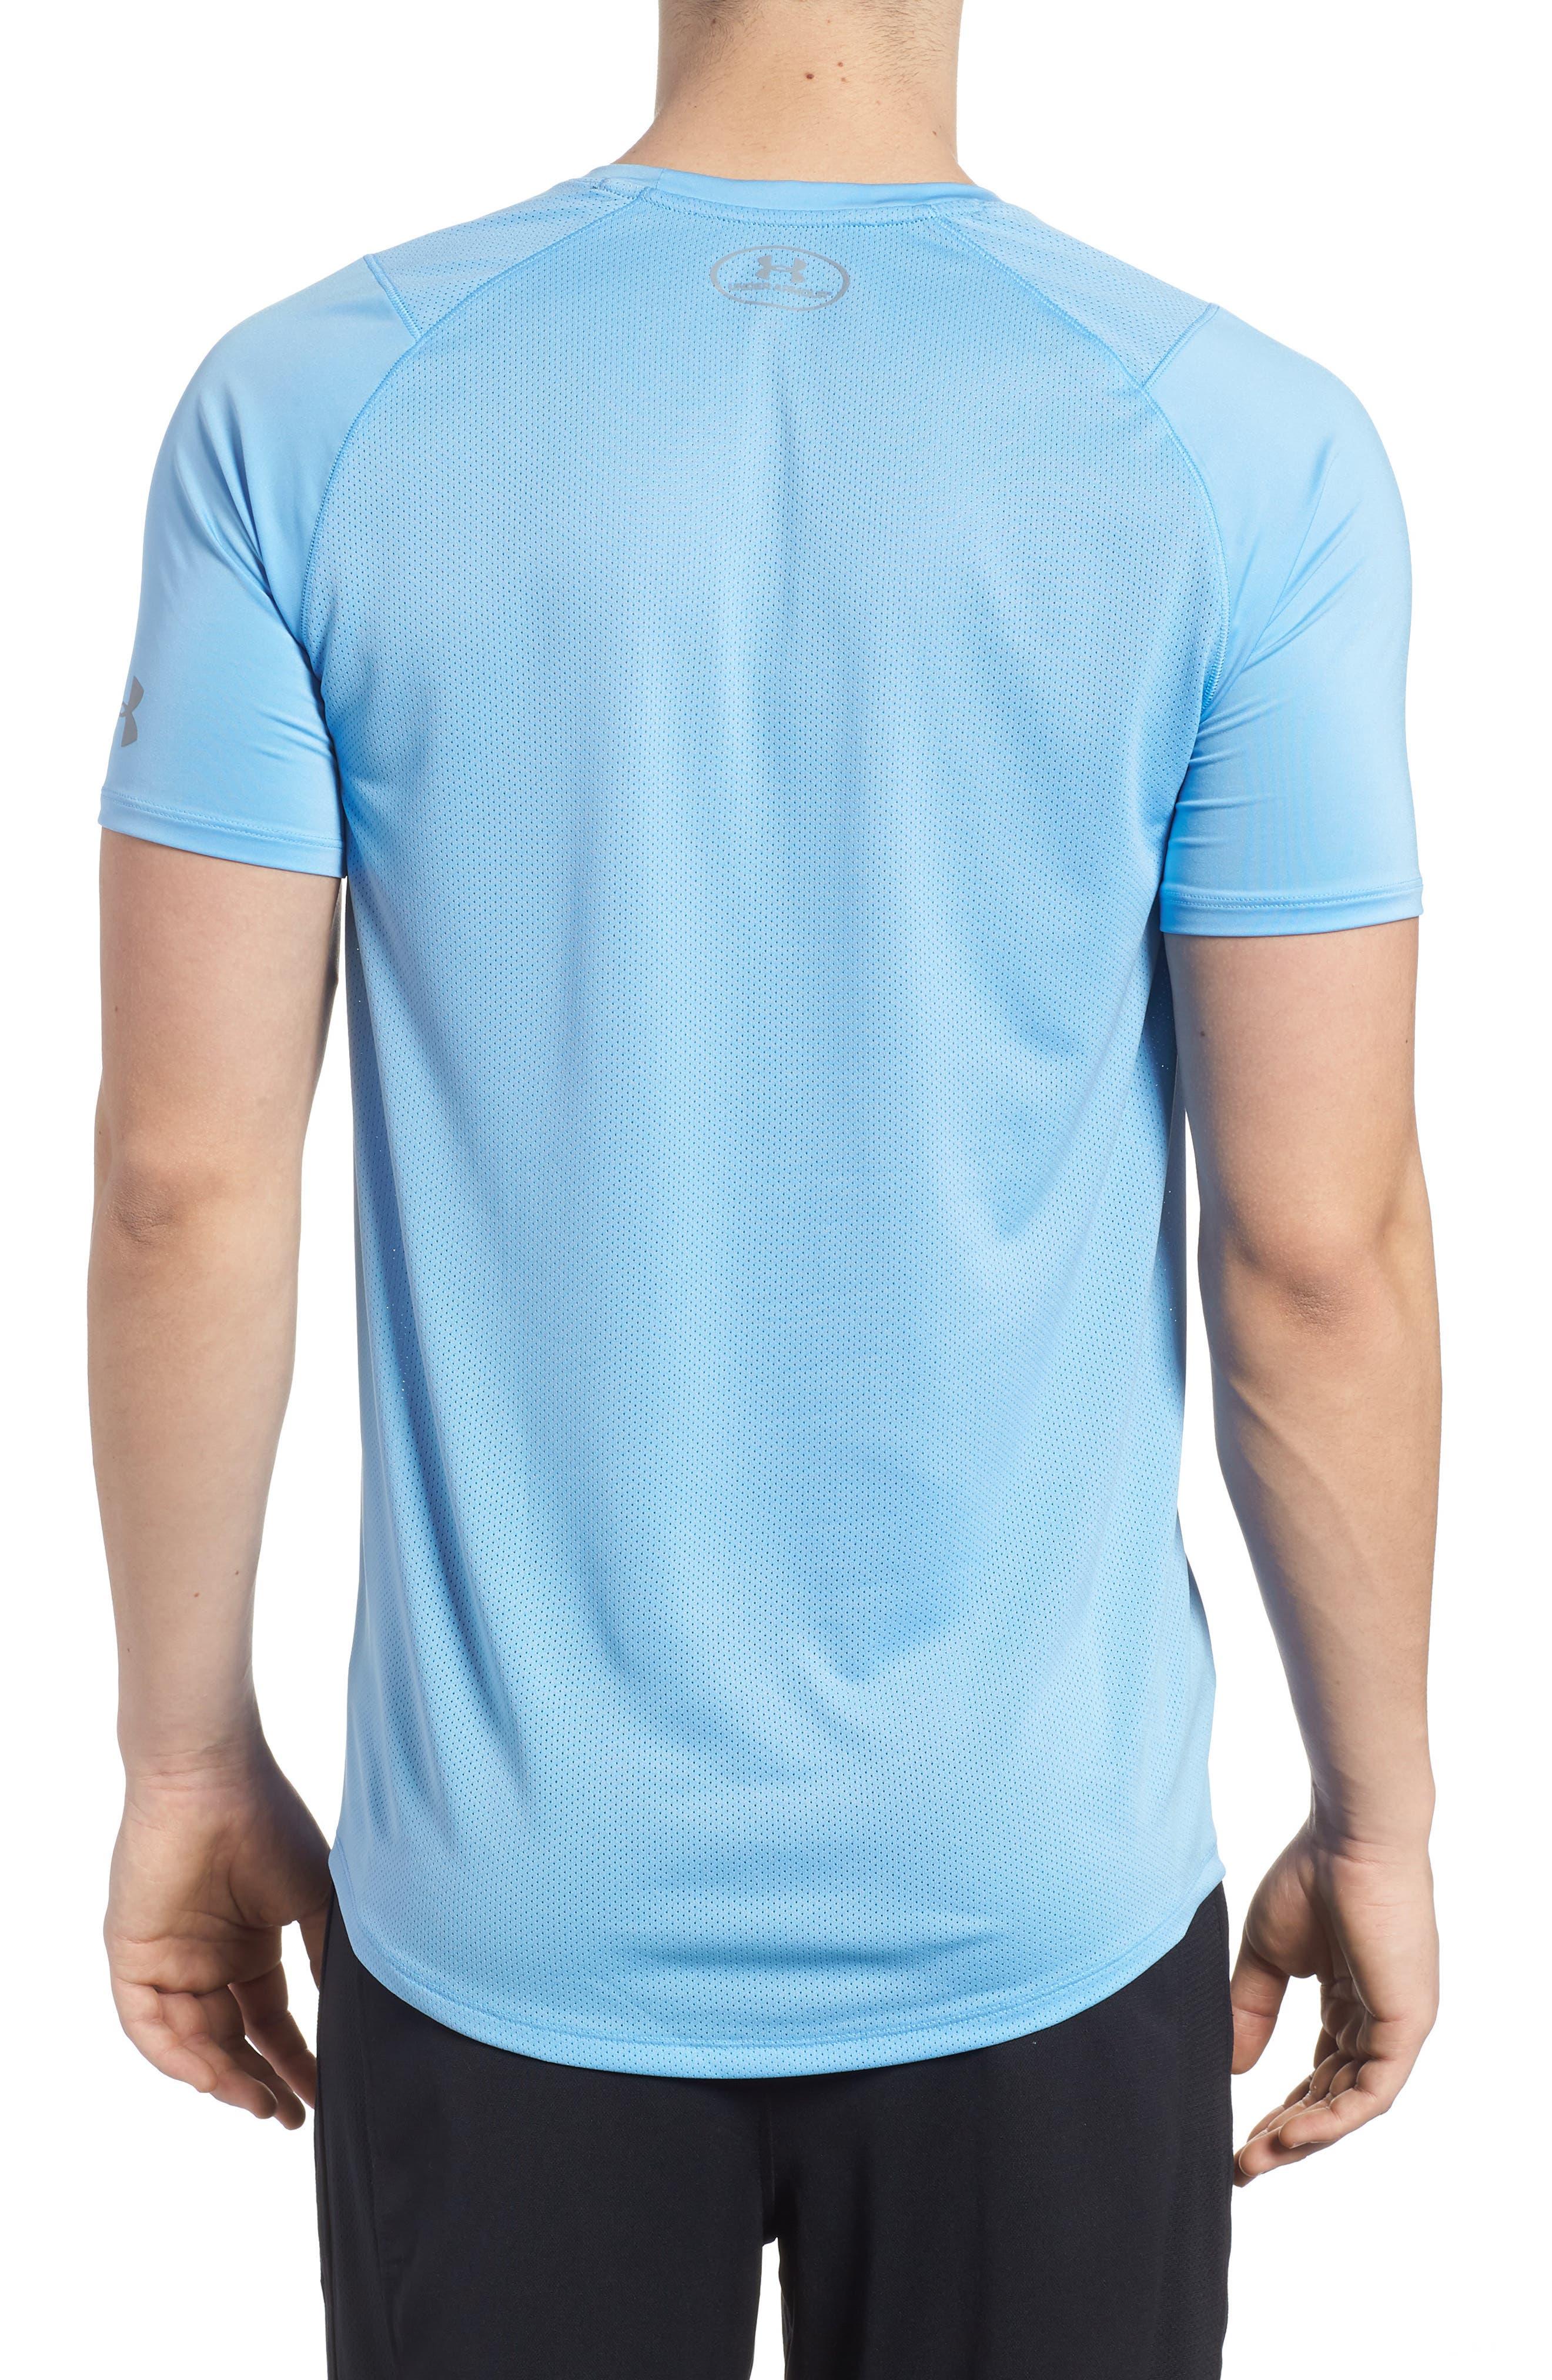 Raid 2.0 Crewneck T-Shirt,                             Alternate thumbnail 2, color,                             Carolina Blue/ Steel